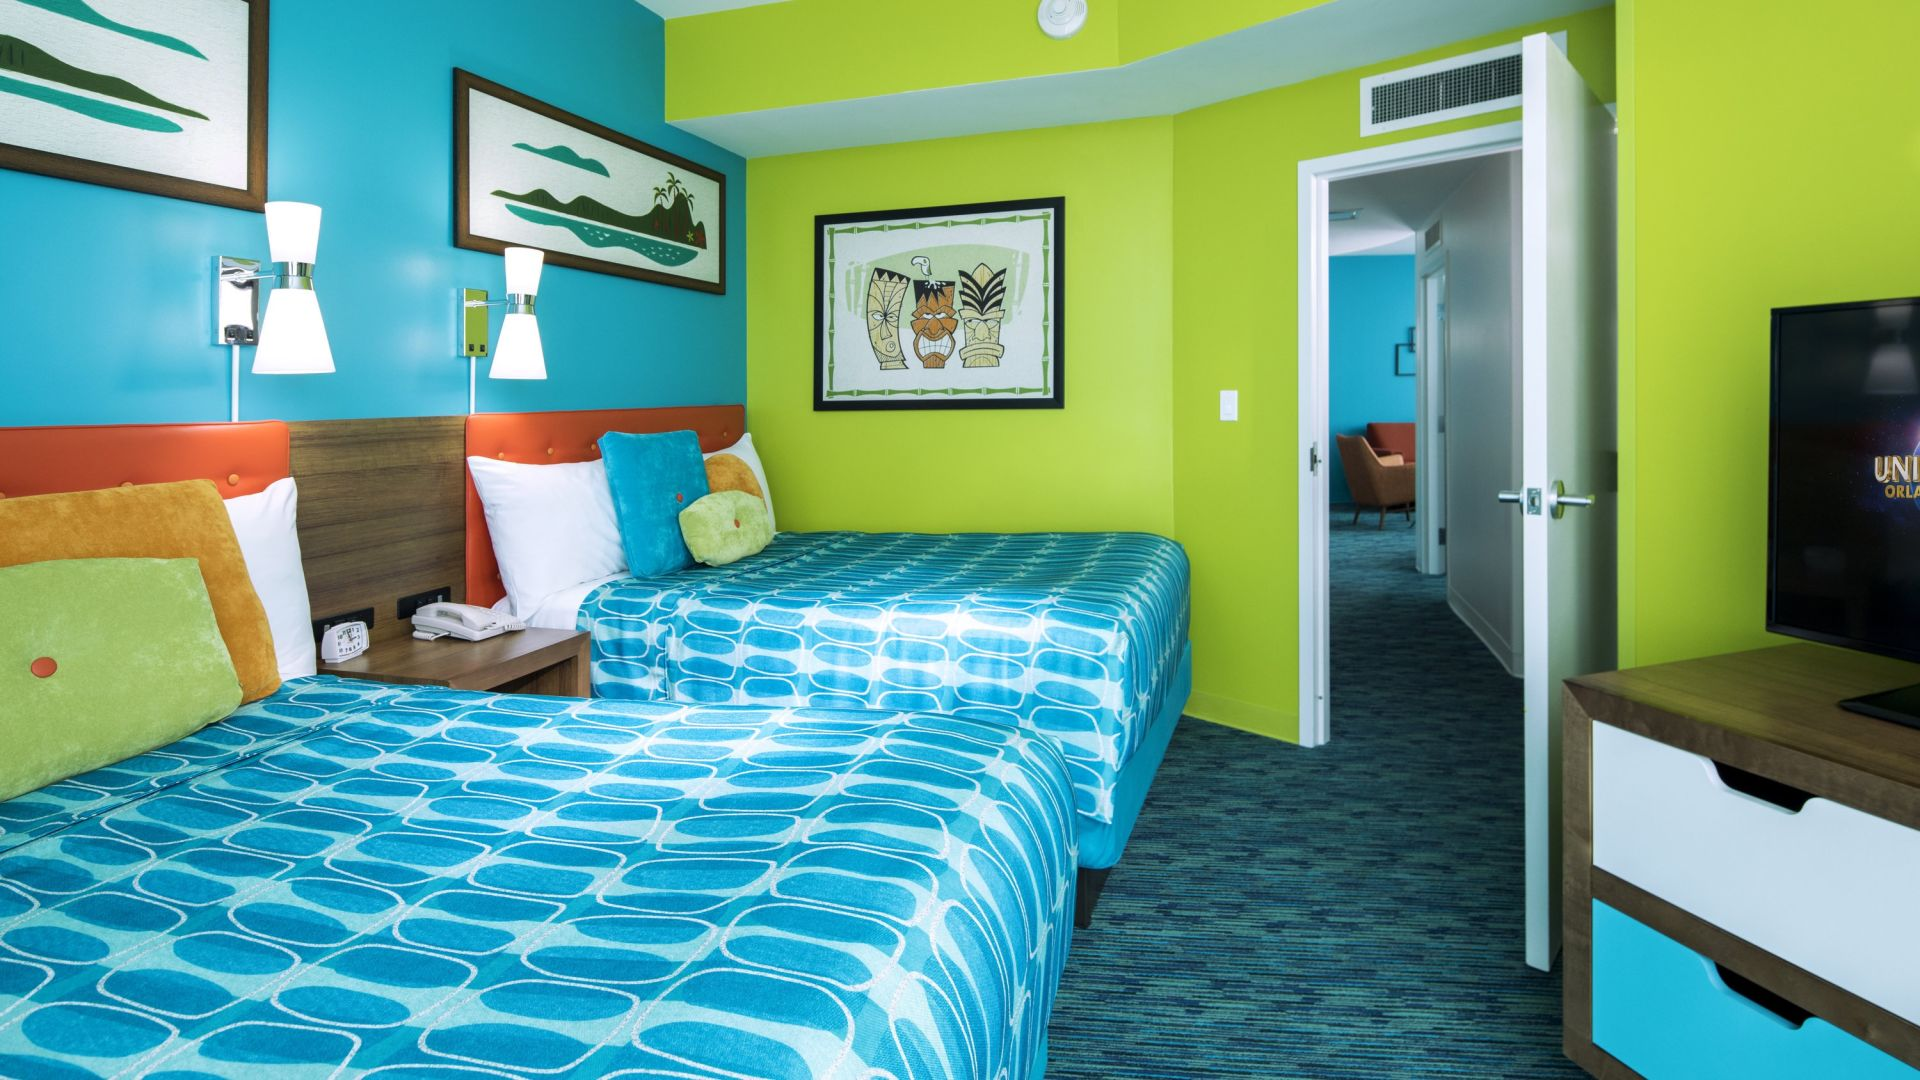 Suites | Cabana Bay Beach Resort | Hotels Near Universal Orlando